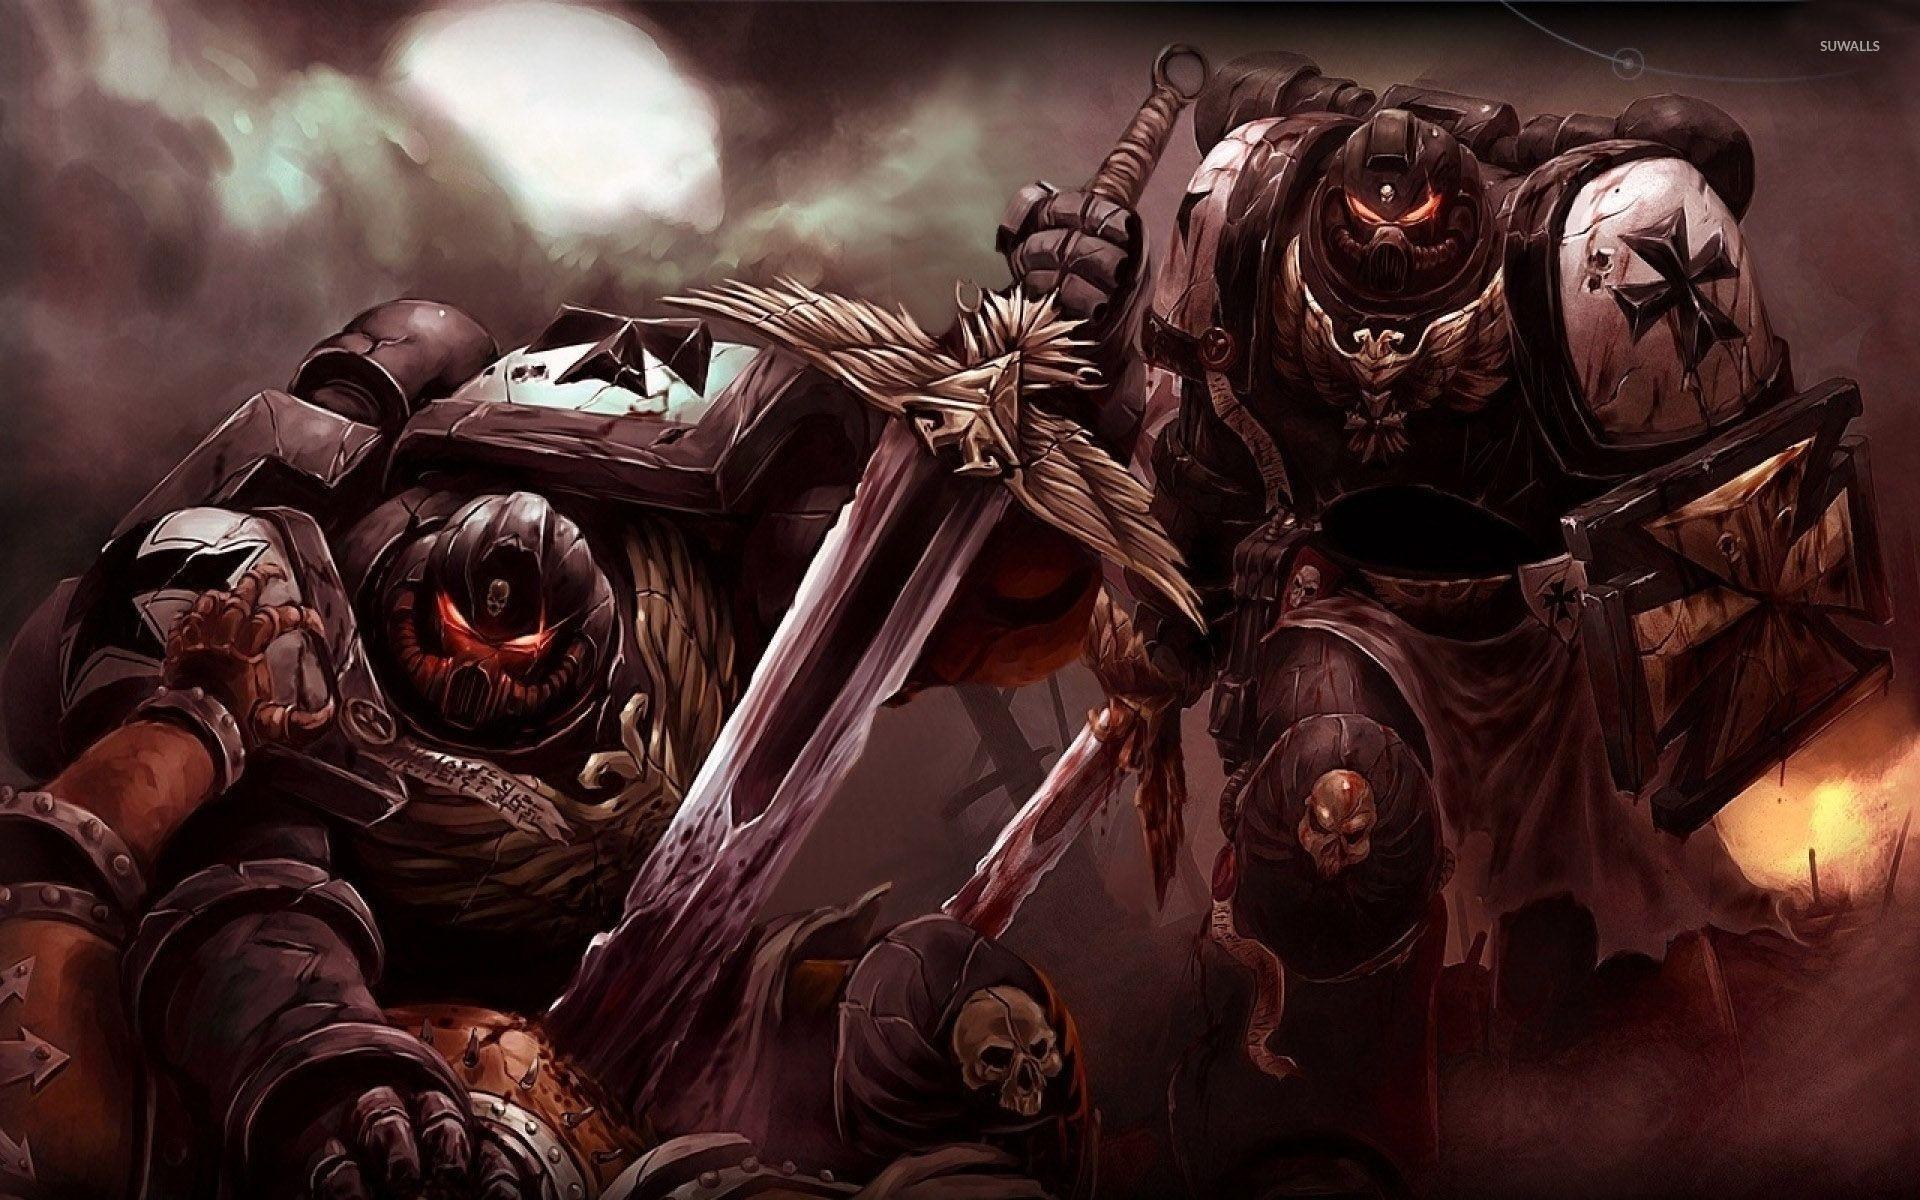 Warhammer 40k death company wallpaper - 1920x1200 Black Templars Warhammer 40 000 Wallpaper Game Wallpapers 30103